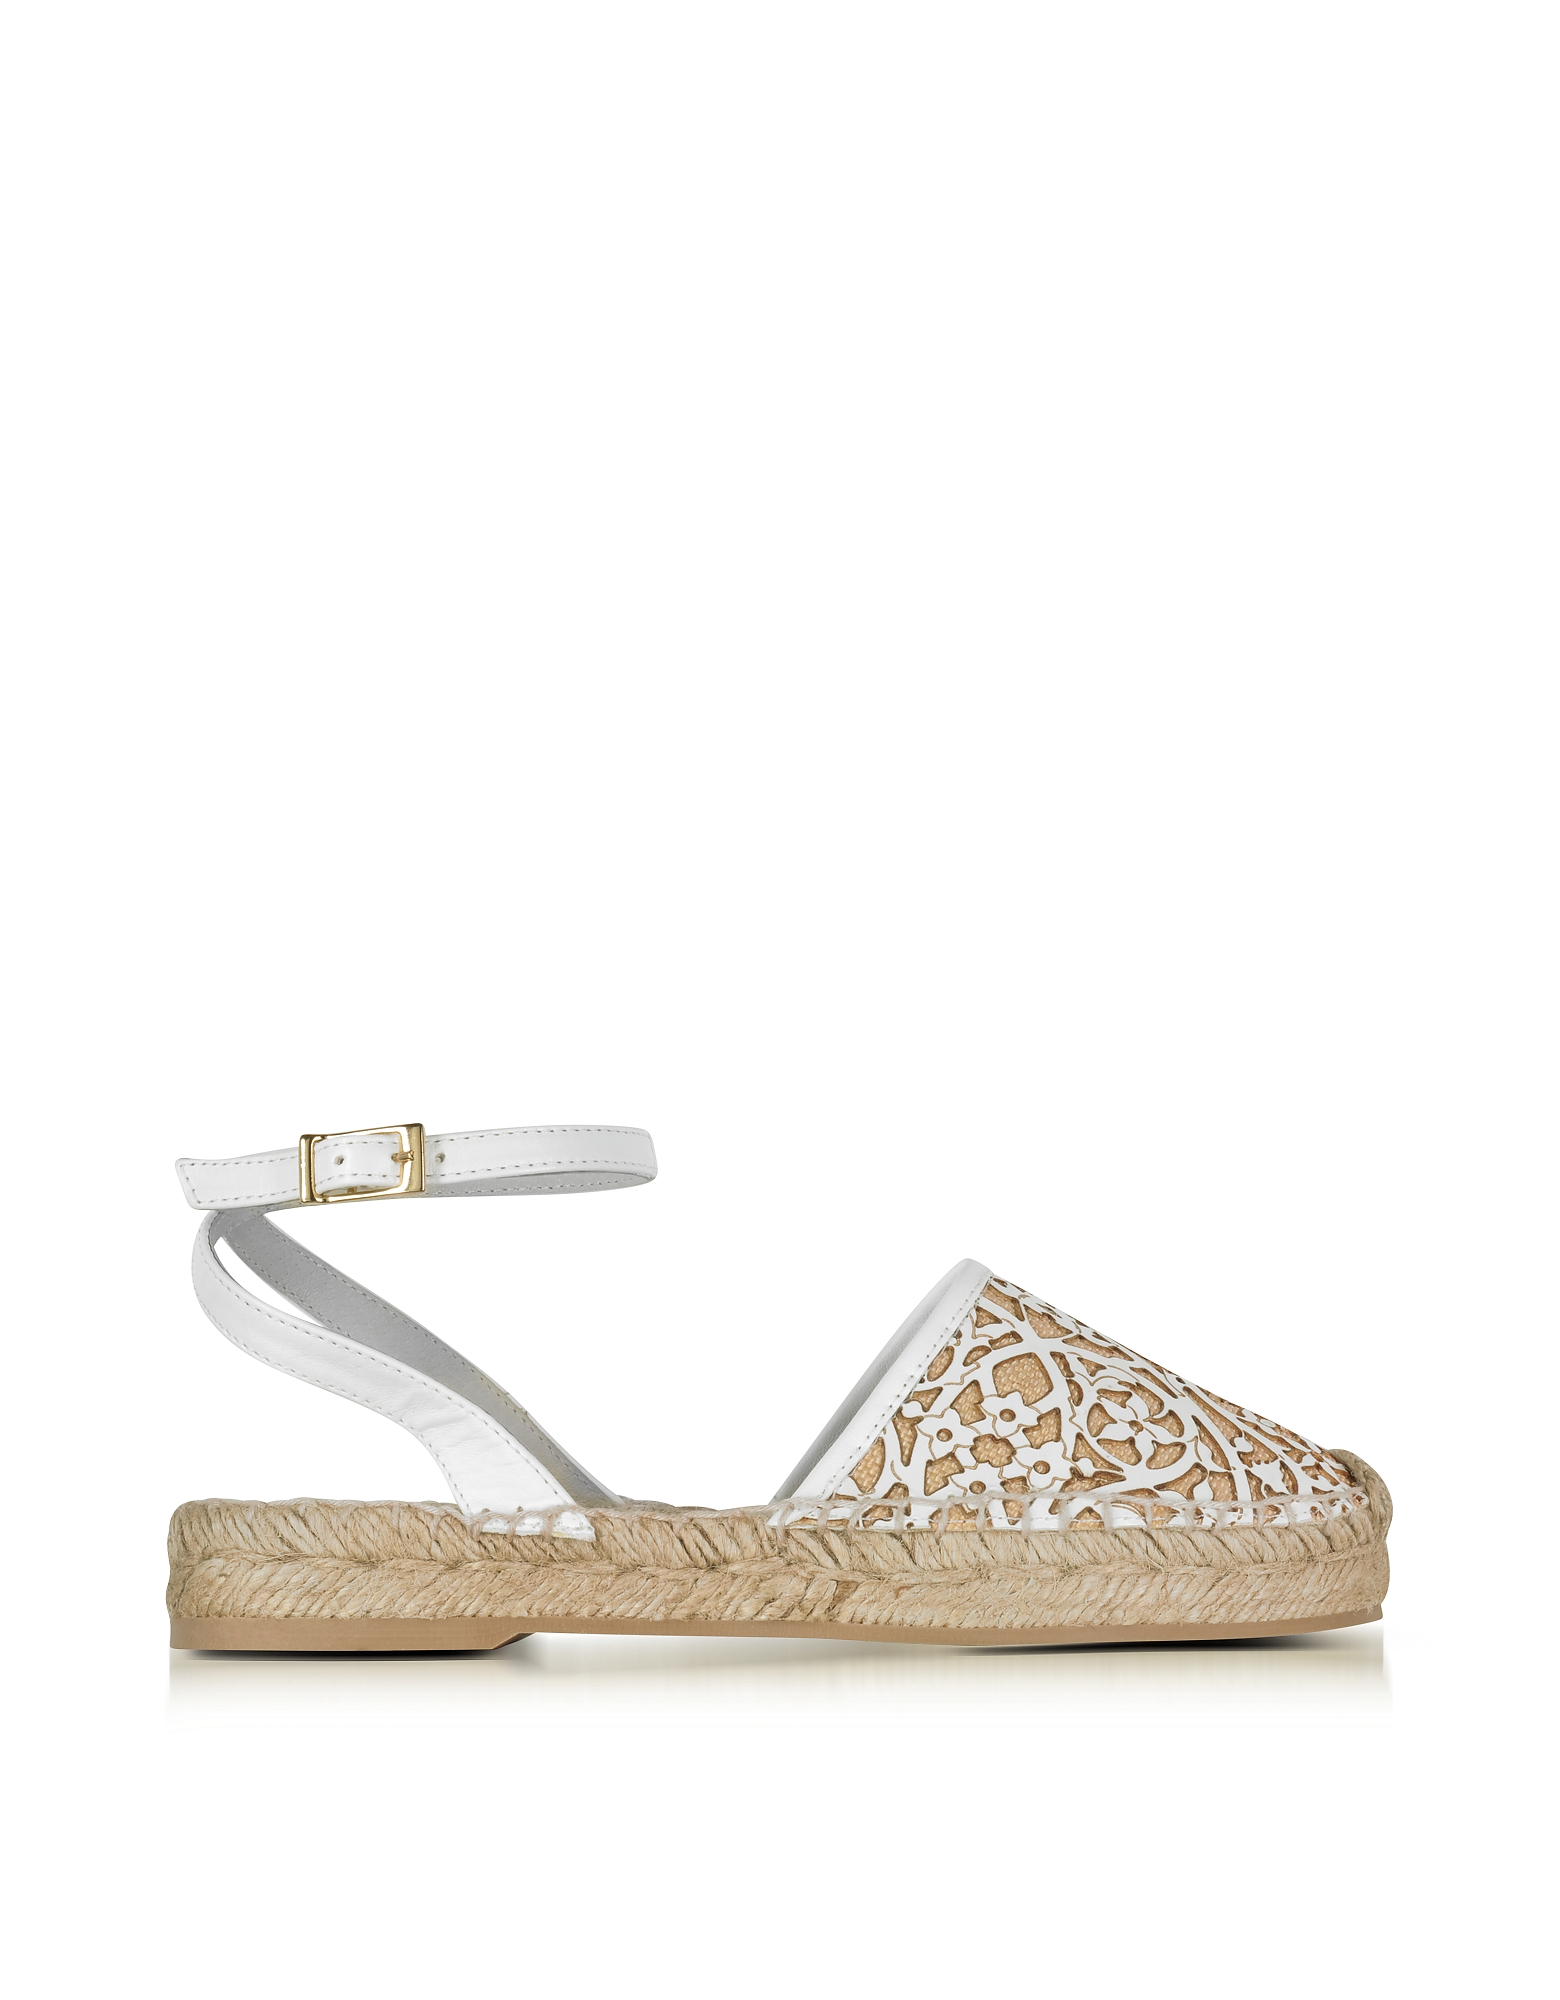 Oscar de la Renta Shoes, Tina White & Beige Lasercut Leather and Raffia Espadrilles